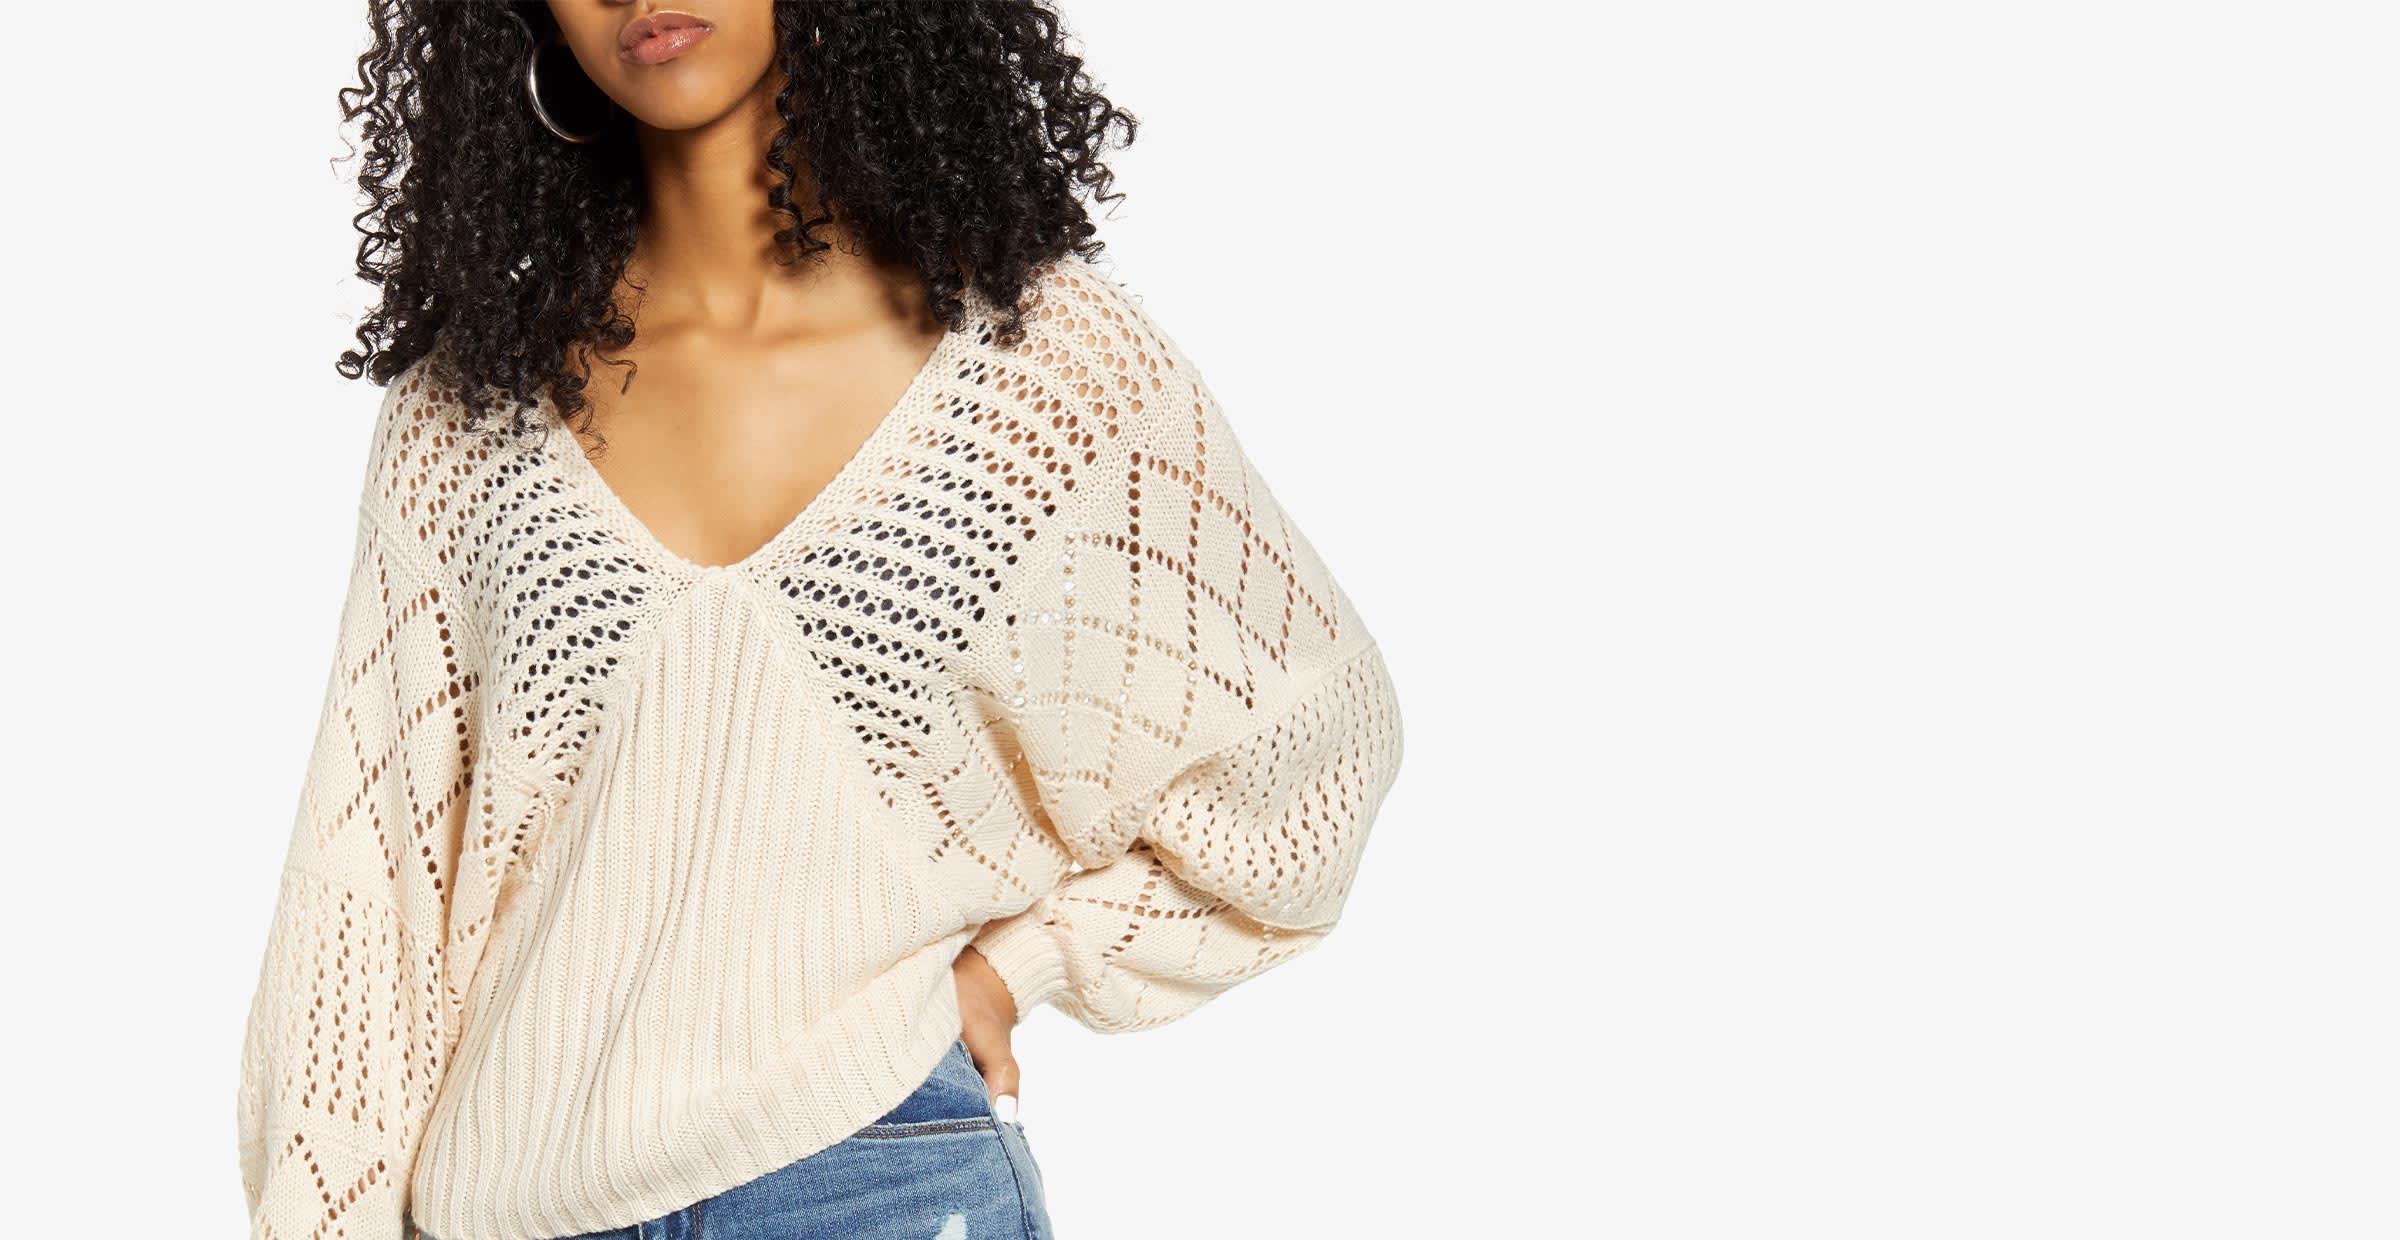 Women in a boho chic sweater